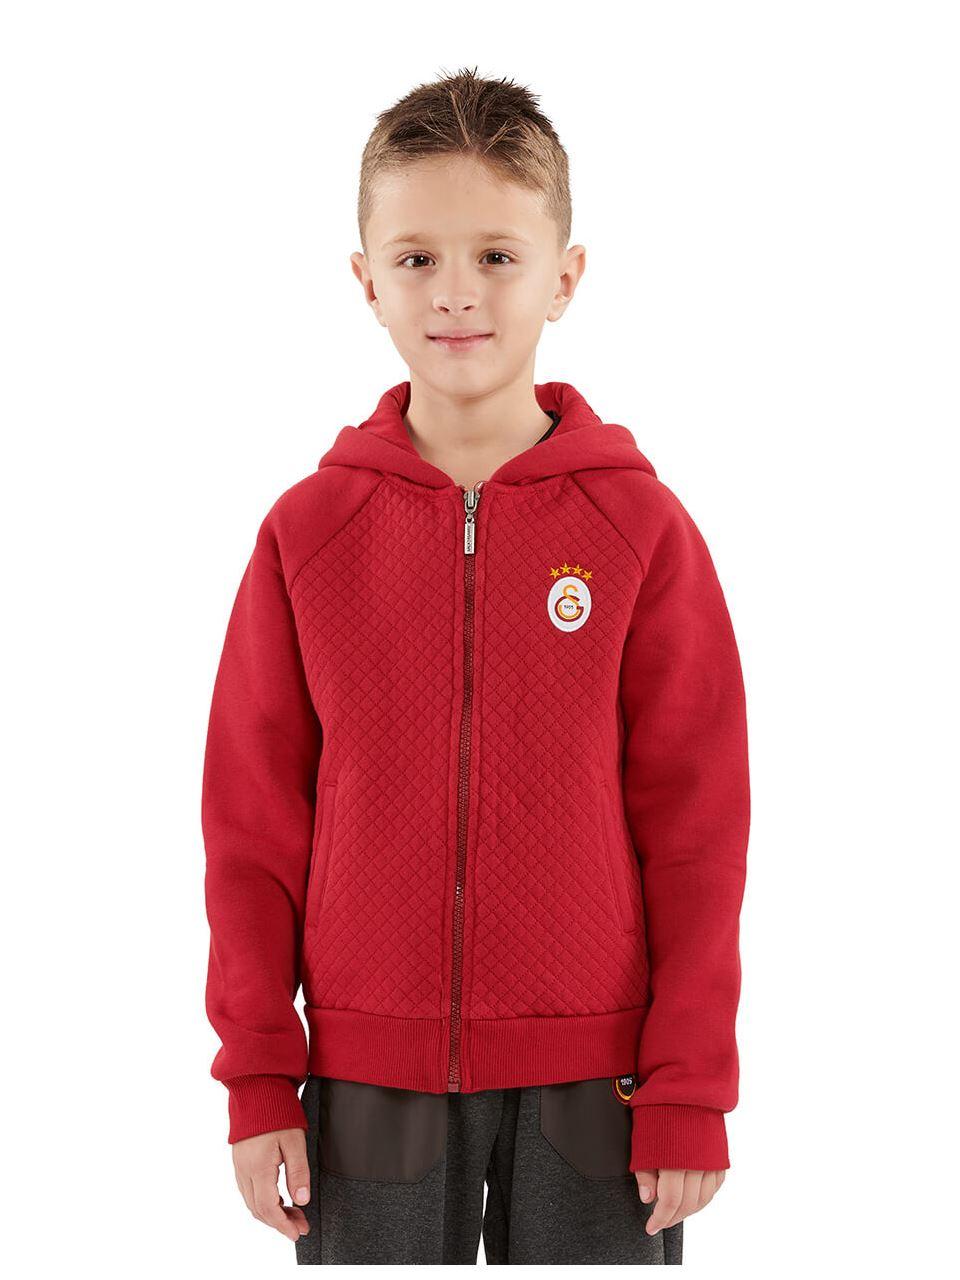 C95064 Sweatshirt